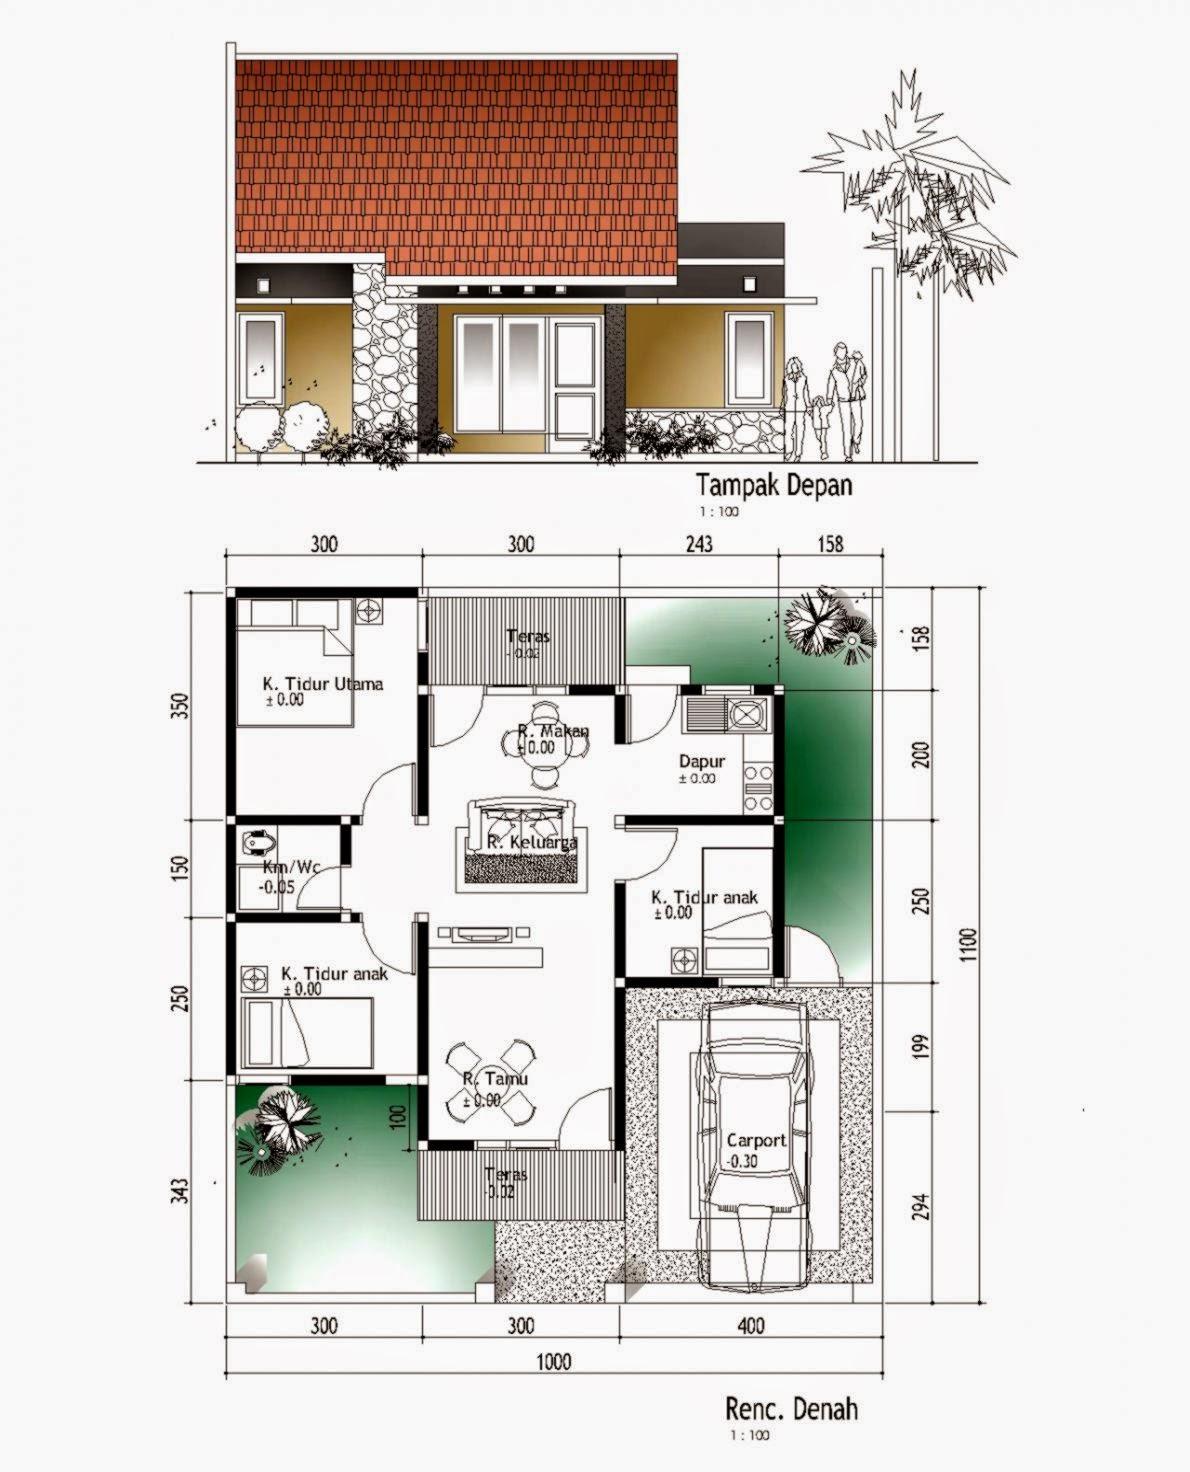 Denah Rumah Minimalis 3 Kamar 10x10 Tahun Ini Denahom